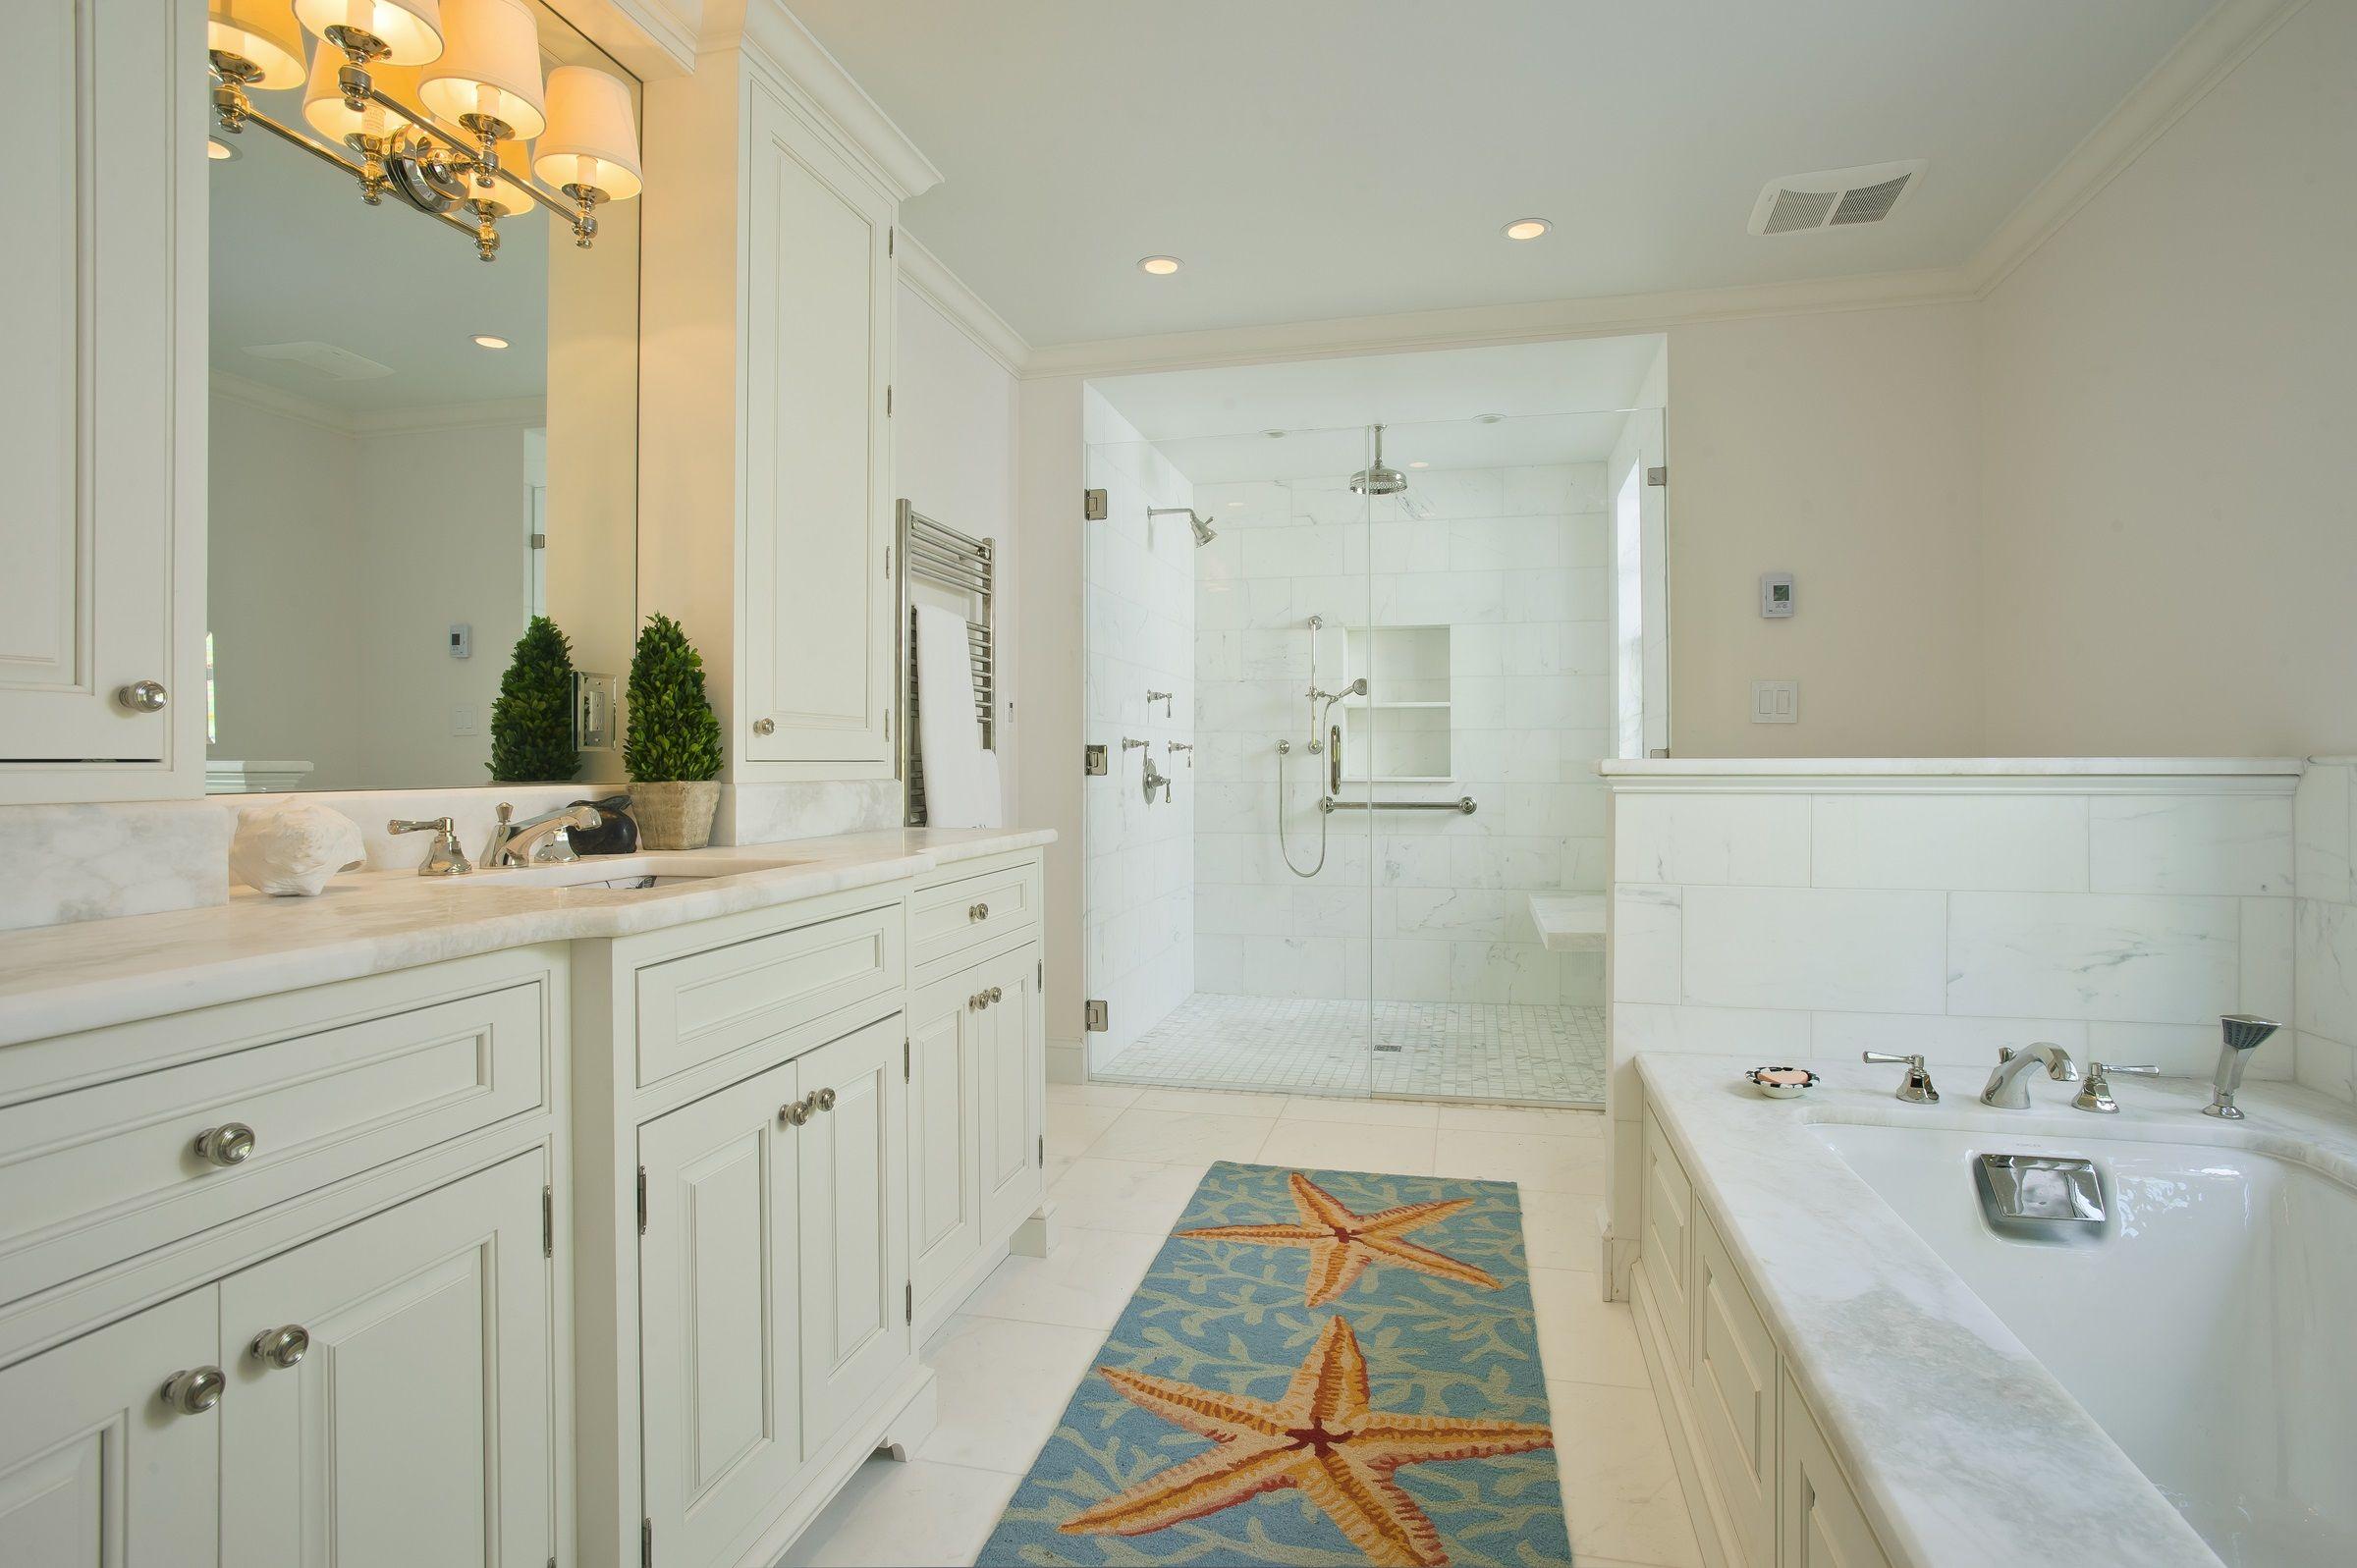 Bathroom Remodel 80 000 100 000 Delbert Adams Construction Group Llc Fresh White Master Bath Towson Md Best Interior Paint Bath Remodel Bathrooms Remodel [ 1597 x 2400 Pixel ]